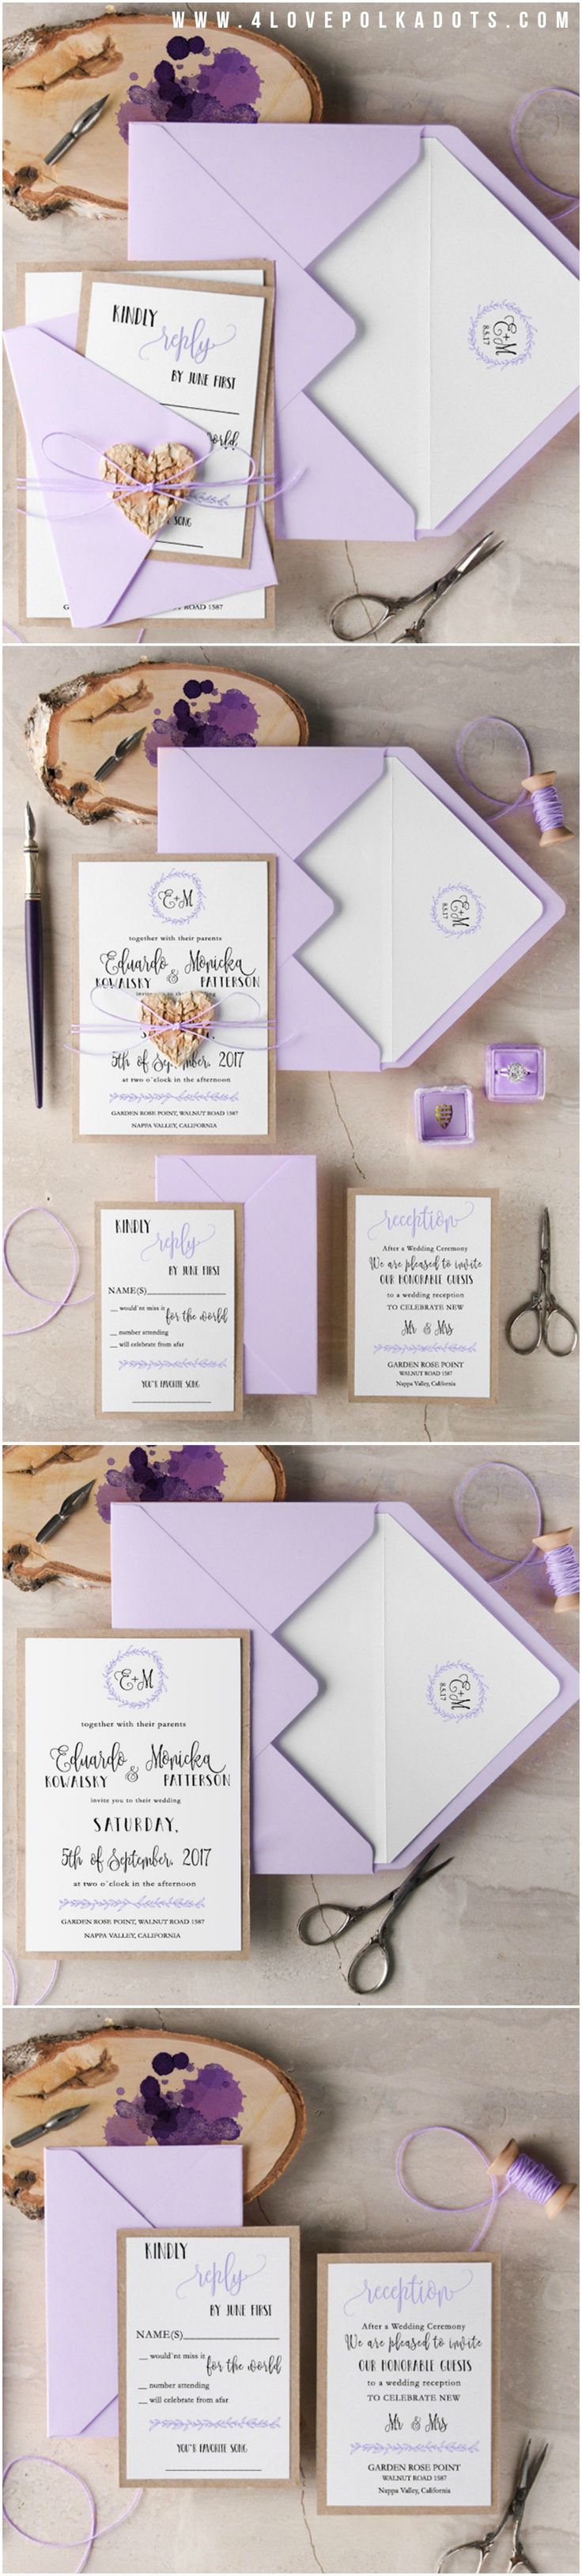 482 Best Card Making Wedding Images On Pinterest Wedding